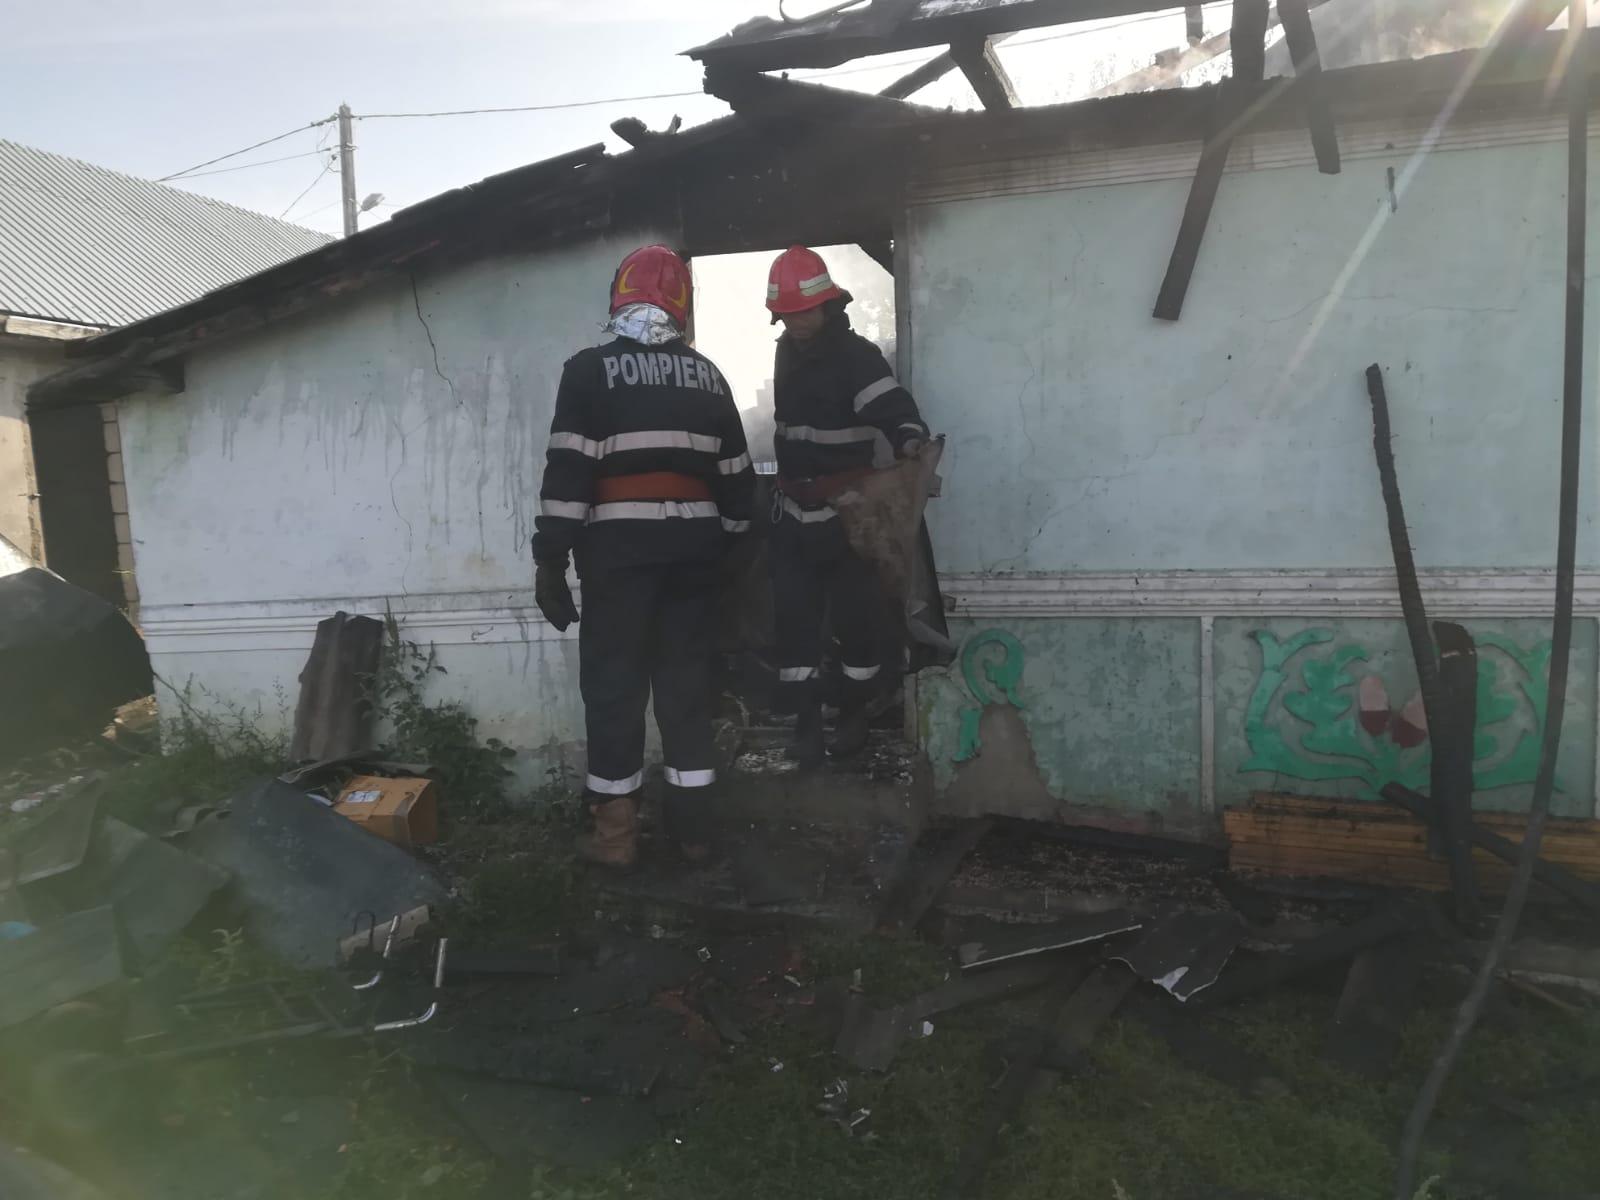 Incendiu la o gospodărie din Tămășeni